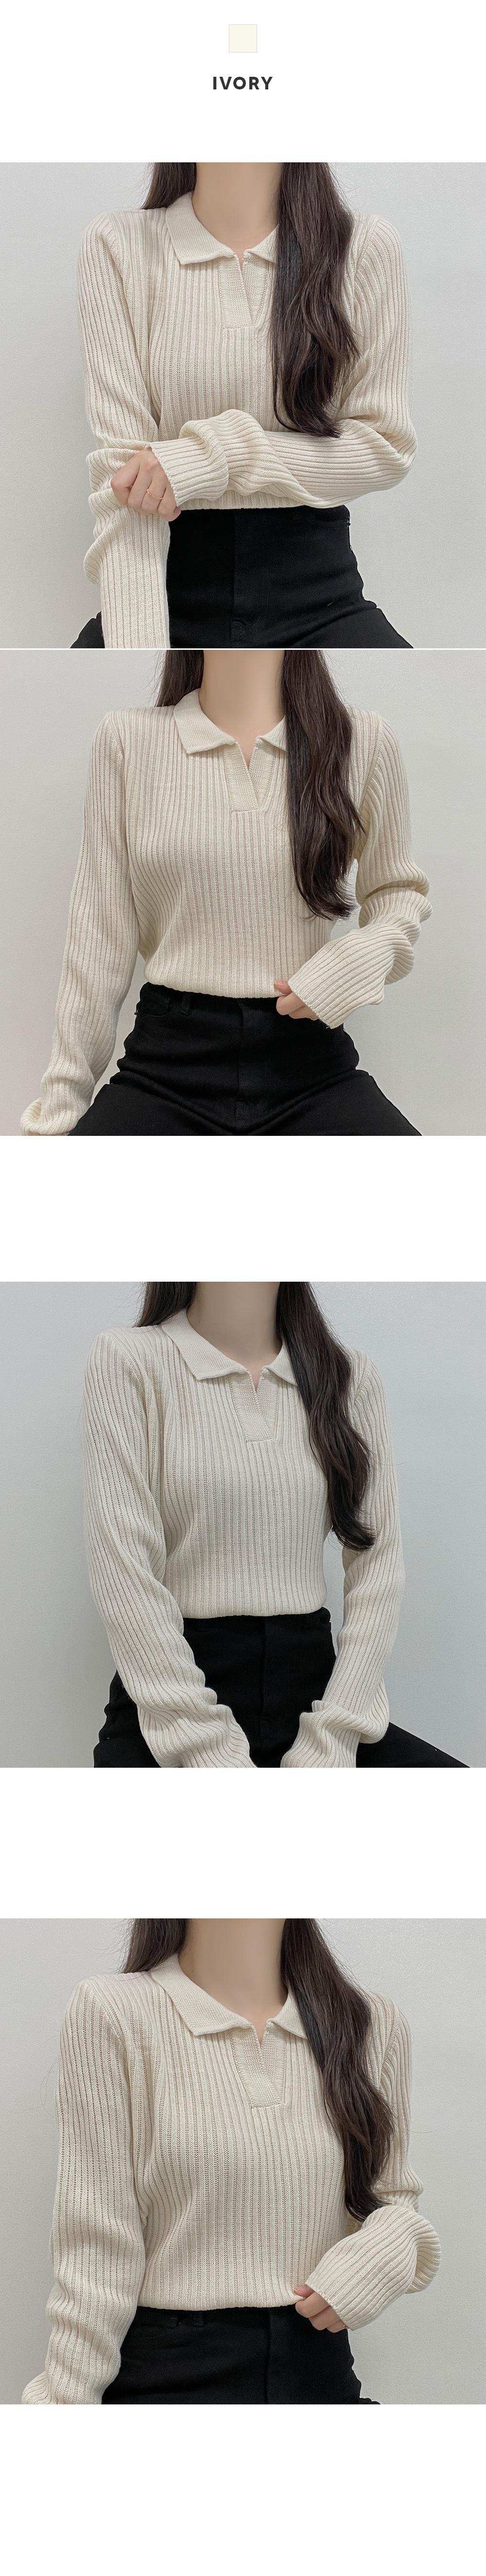 Baguette, Basic Ribbed Norton Collar Knitwear